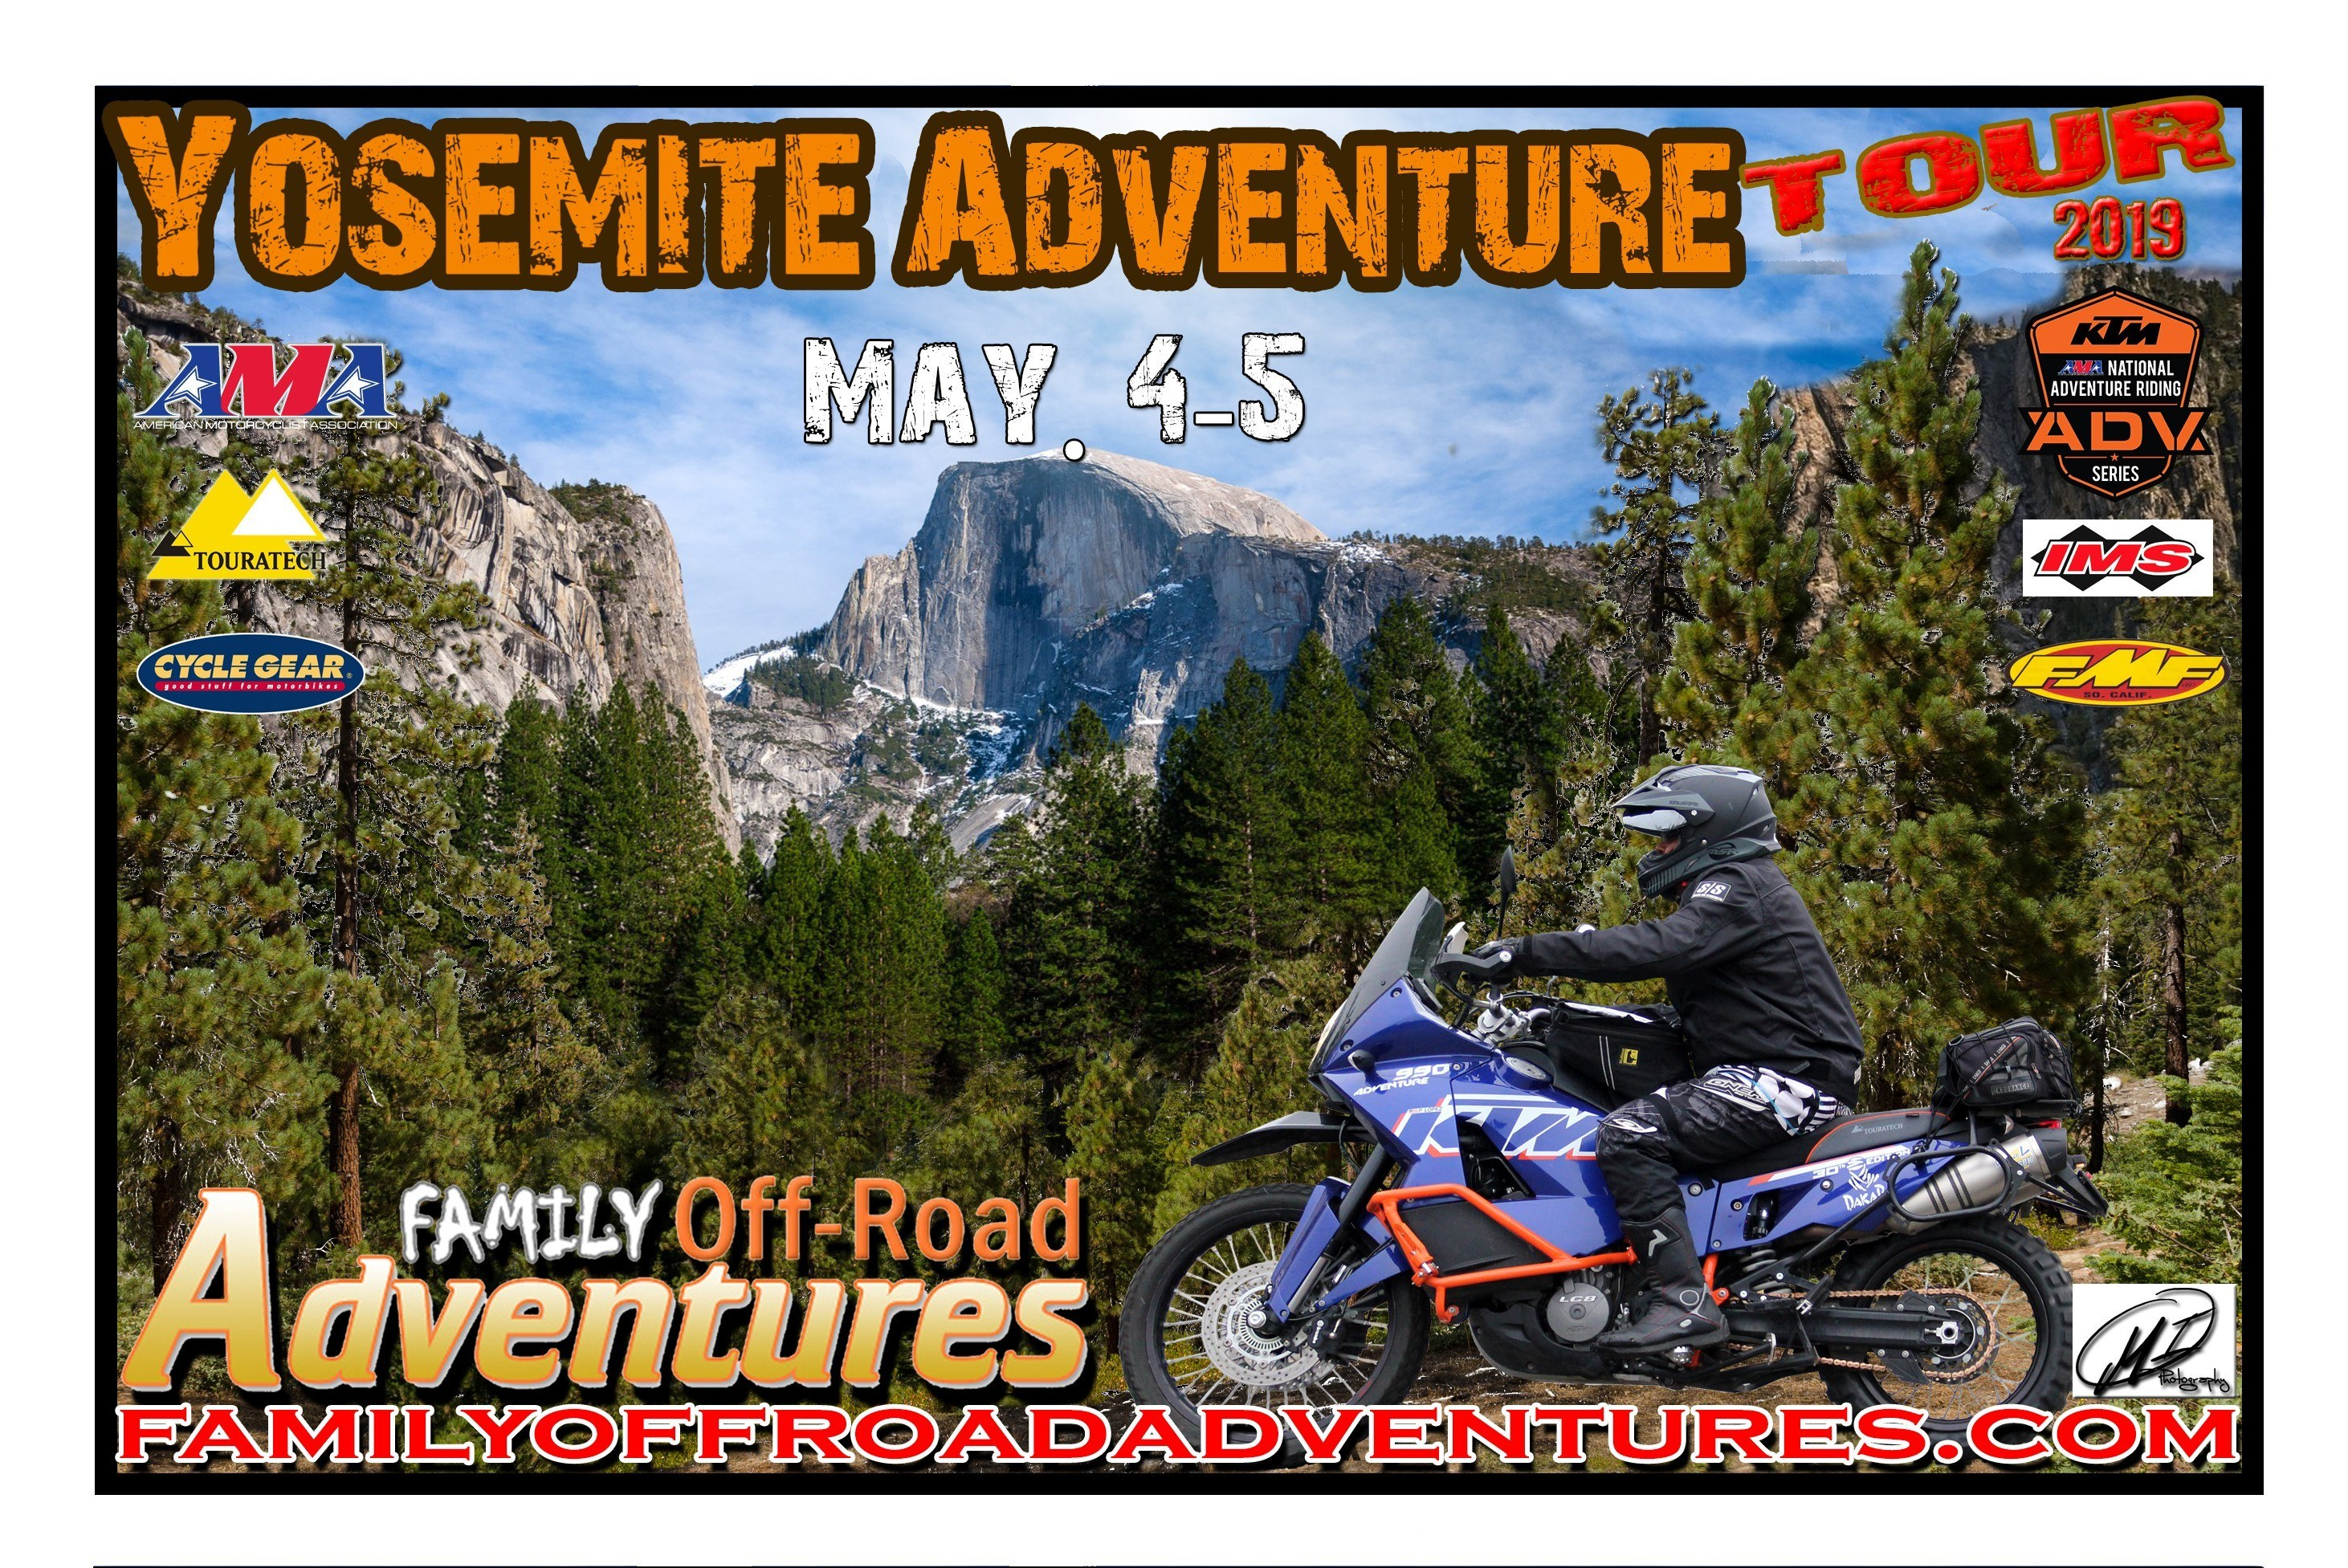 2019 Yosemite Adventure Tour Flyer